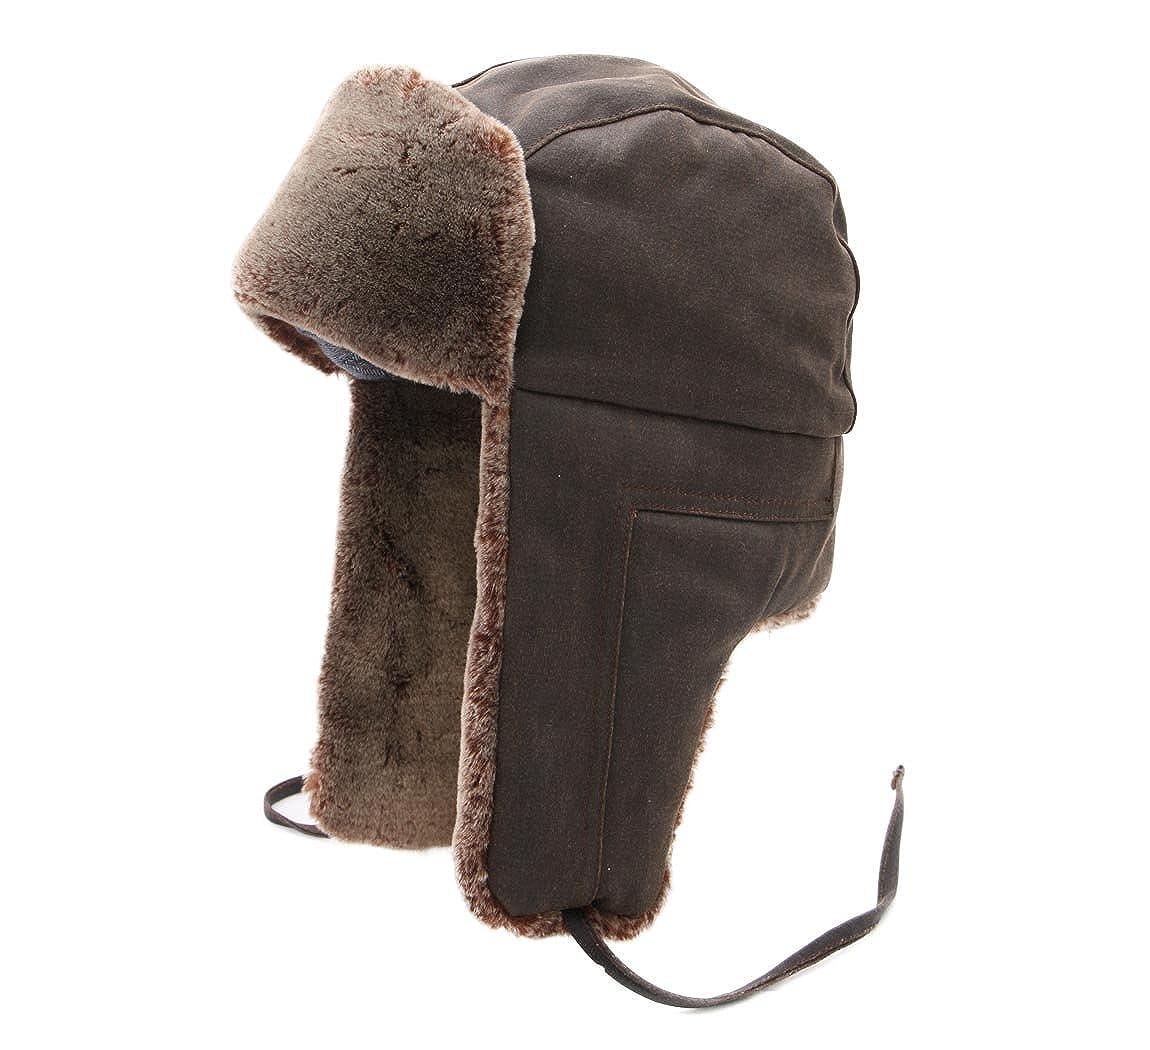 450ac8018 Stetson - Trapper Hat Men Palo: Amazon.co.uk: Clothing